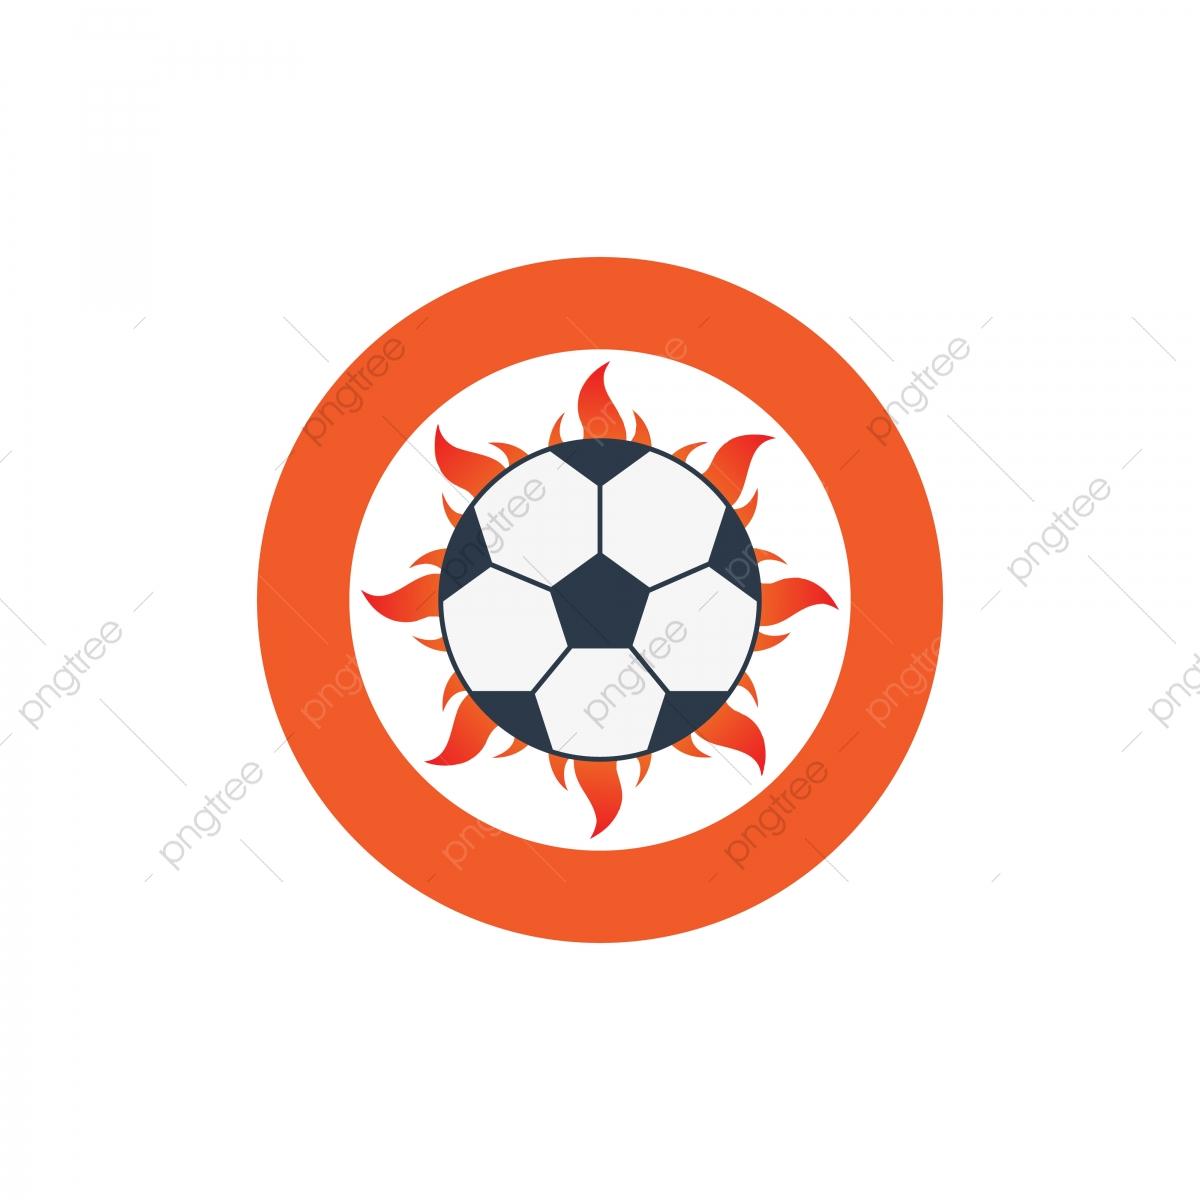 Symbol Fur Vektorillustration Fussball Logo Mit Feuer Und